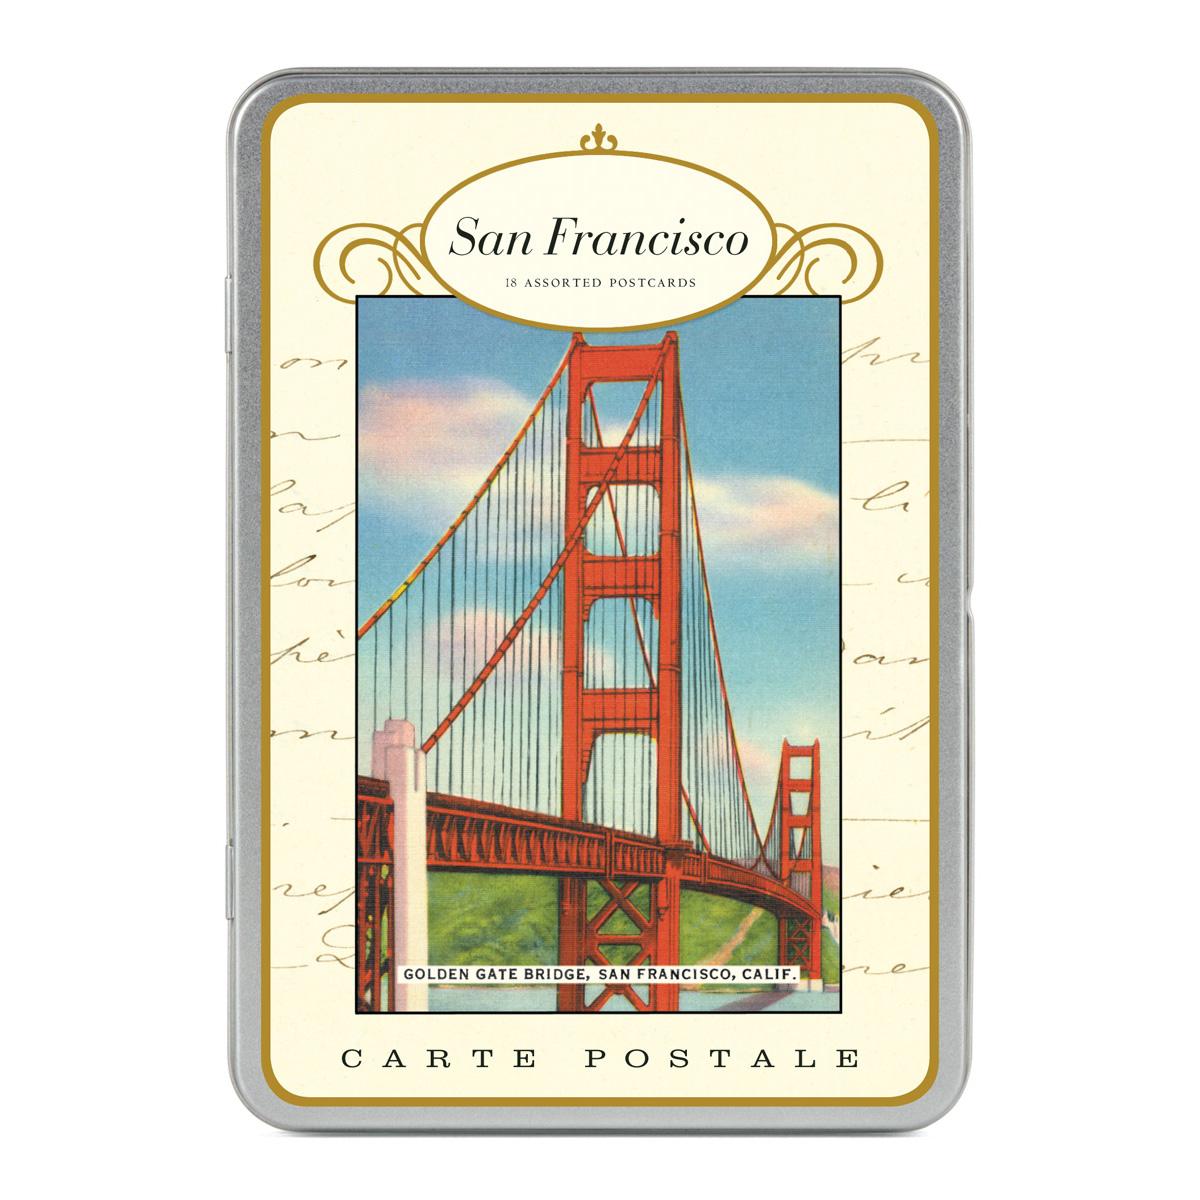 cavallini carte postale san francisco tin of 18 postcards 9 designs ebay. Black Bedroom Furniture Sets. Home Design Ideas